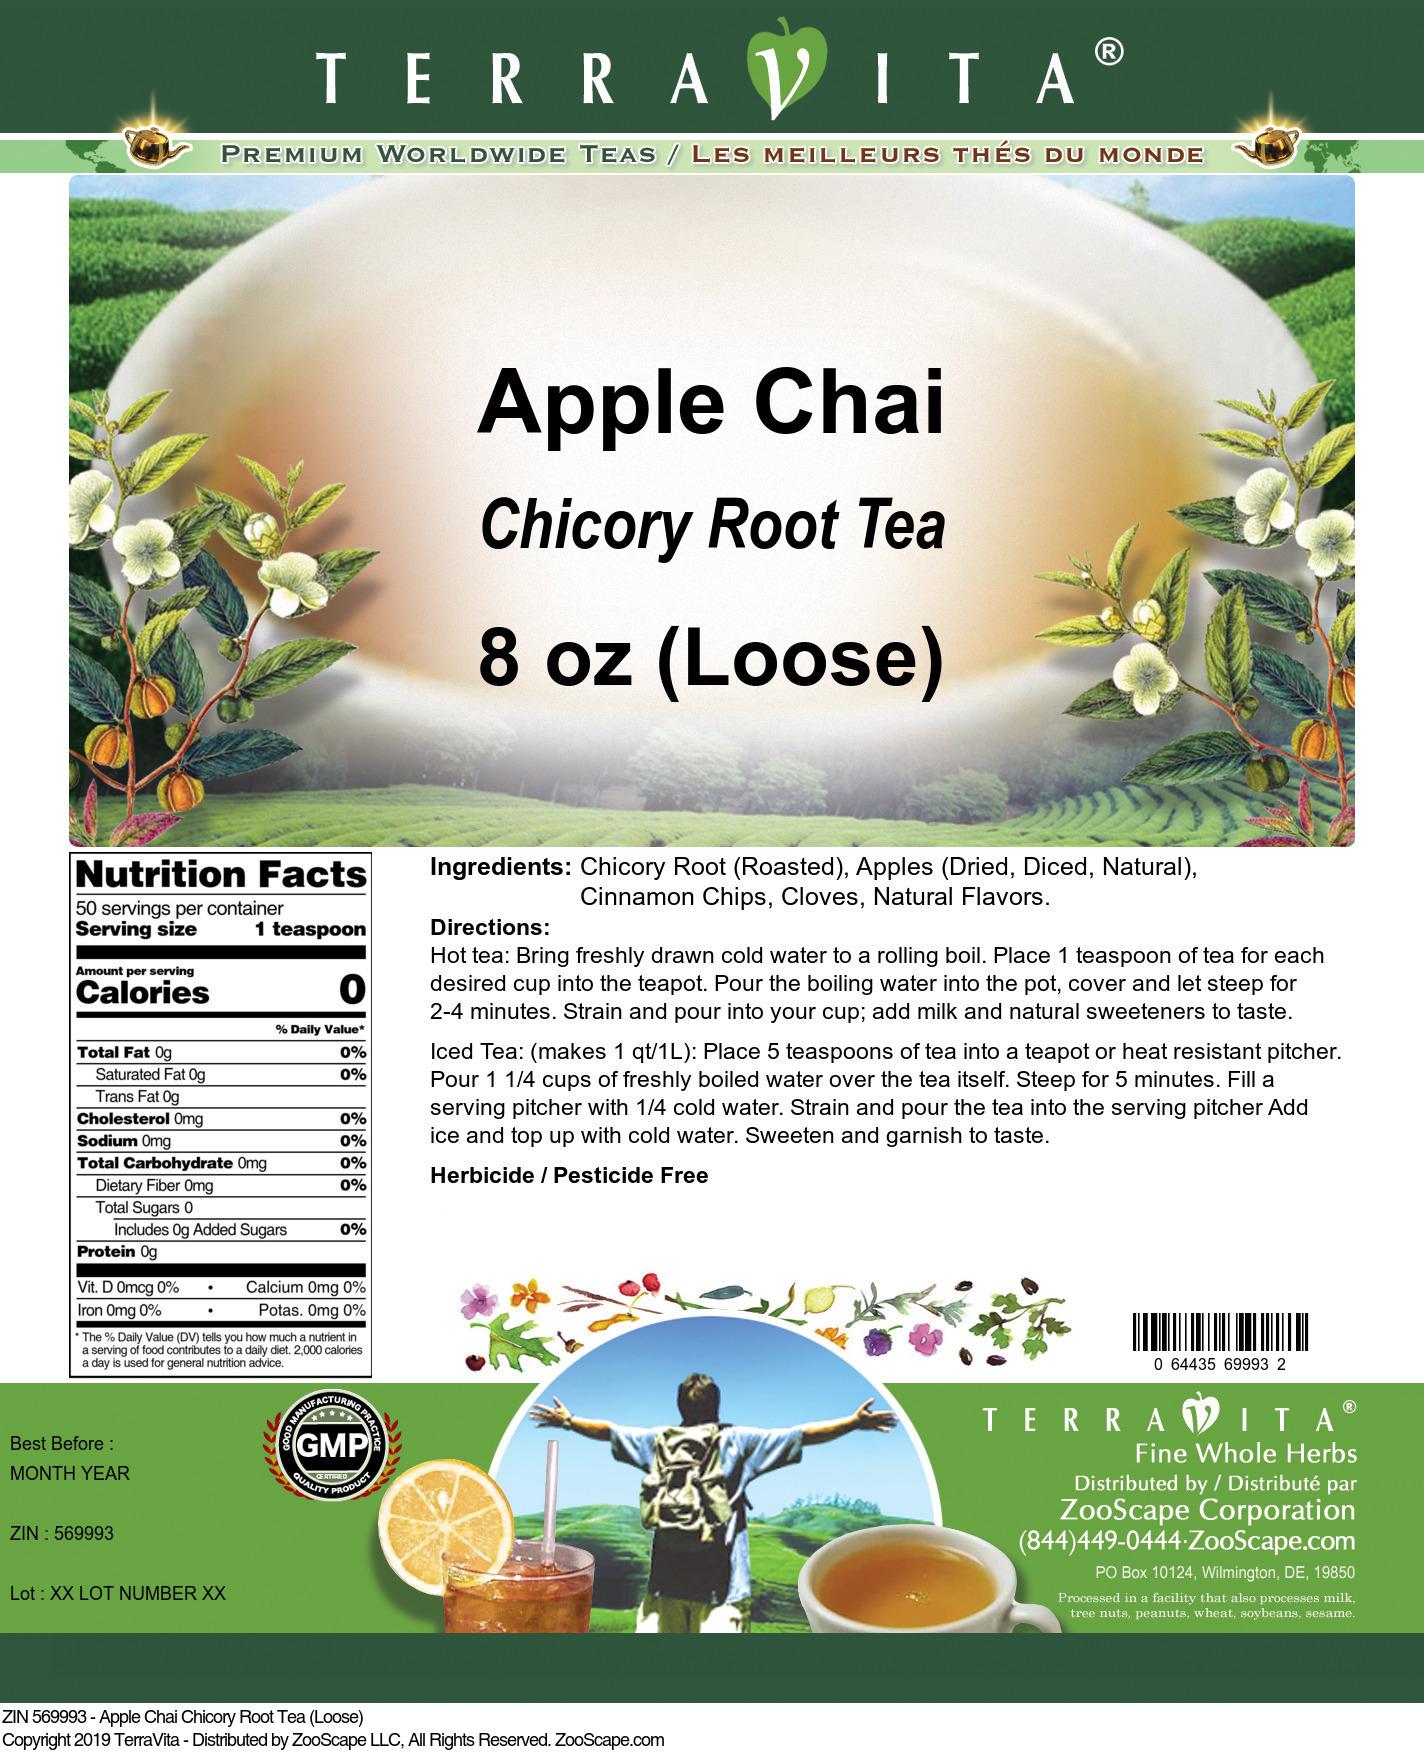 Apple Chai Chicory Root